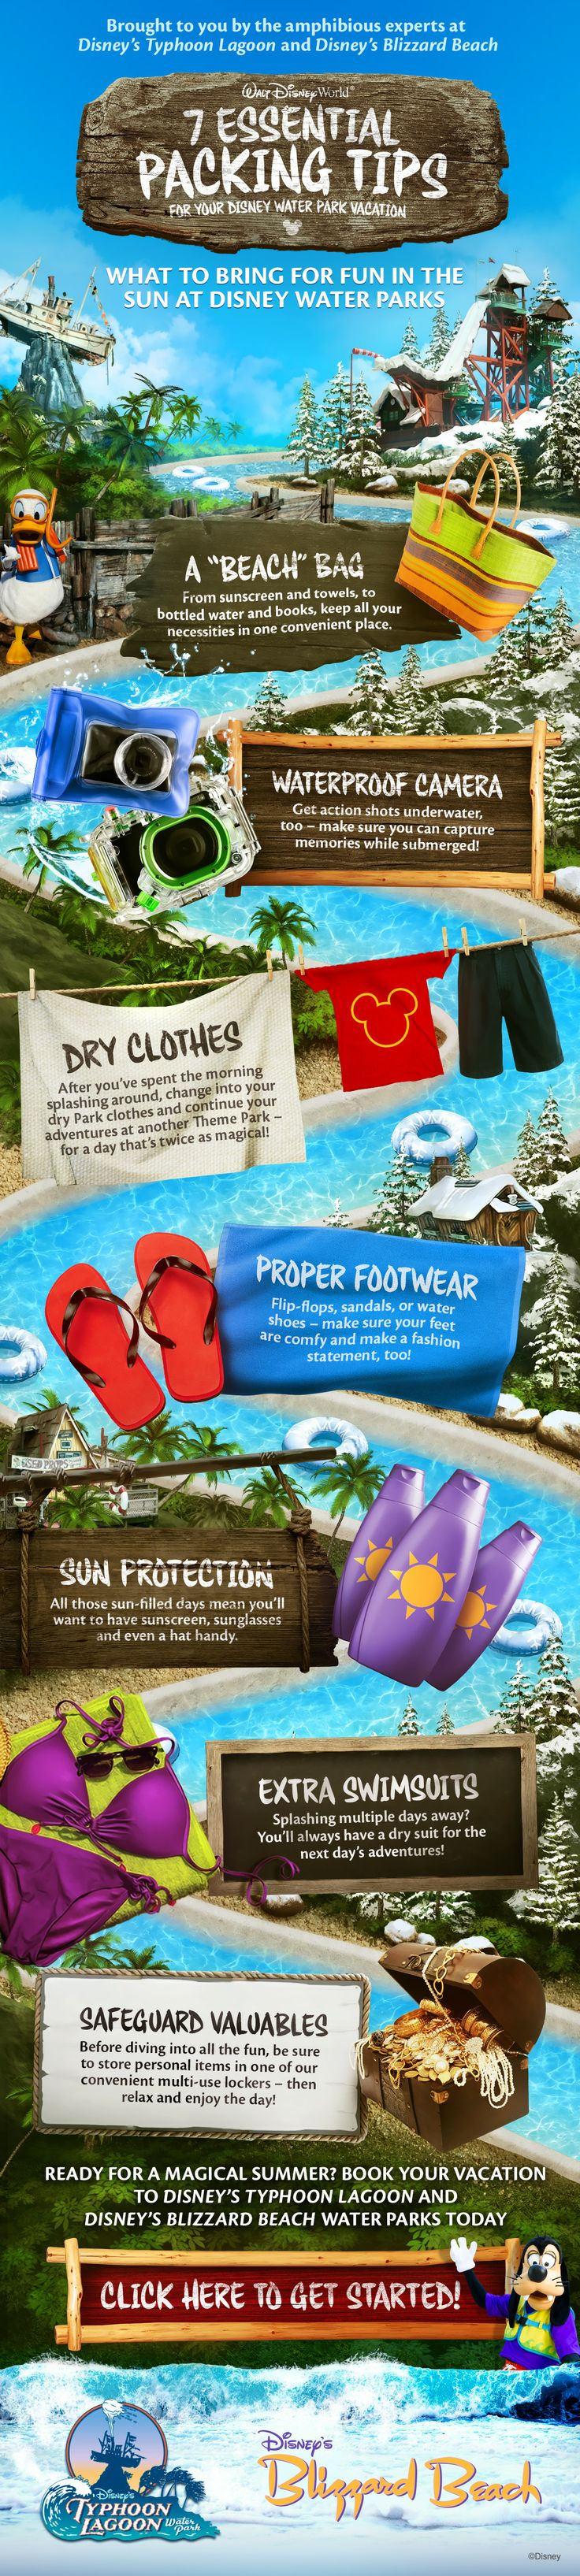 7 Essential Packing Tips for your Disney Water Park Vacation! #summer #pool #tricks #WaltDisneyWorld